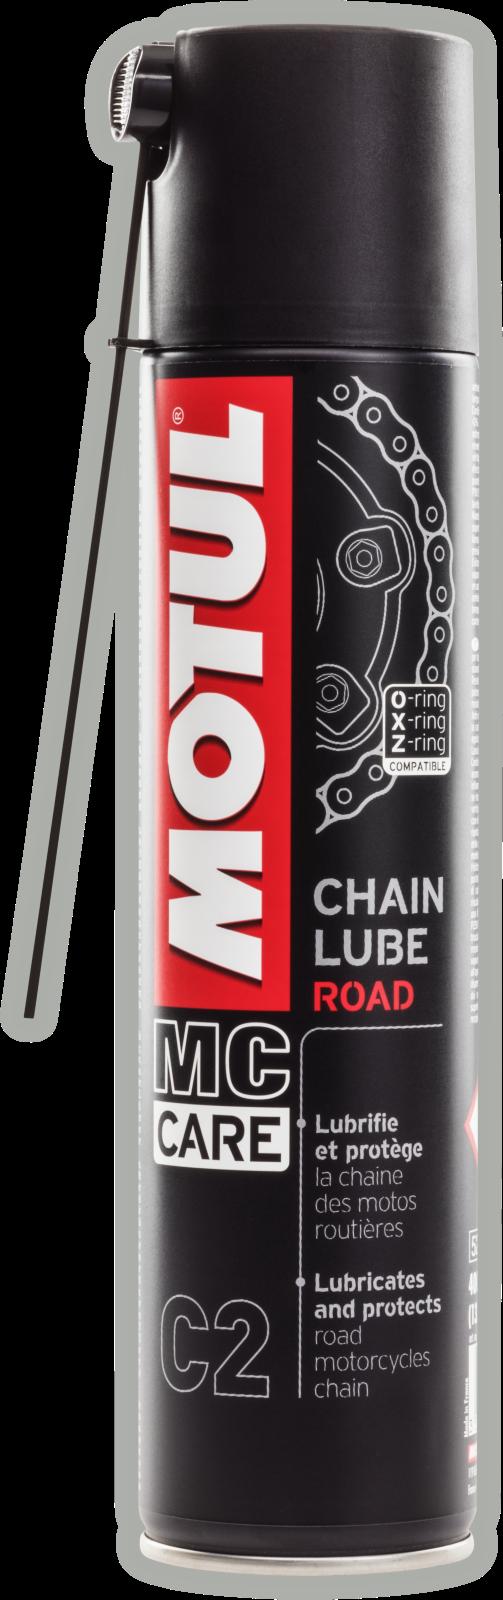 MOTUL AG MOTUL C2 Chain Lube Road  0,4L